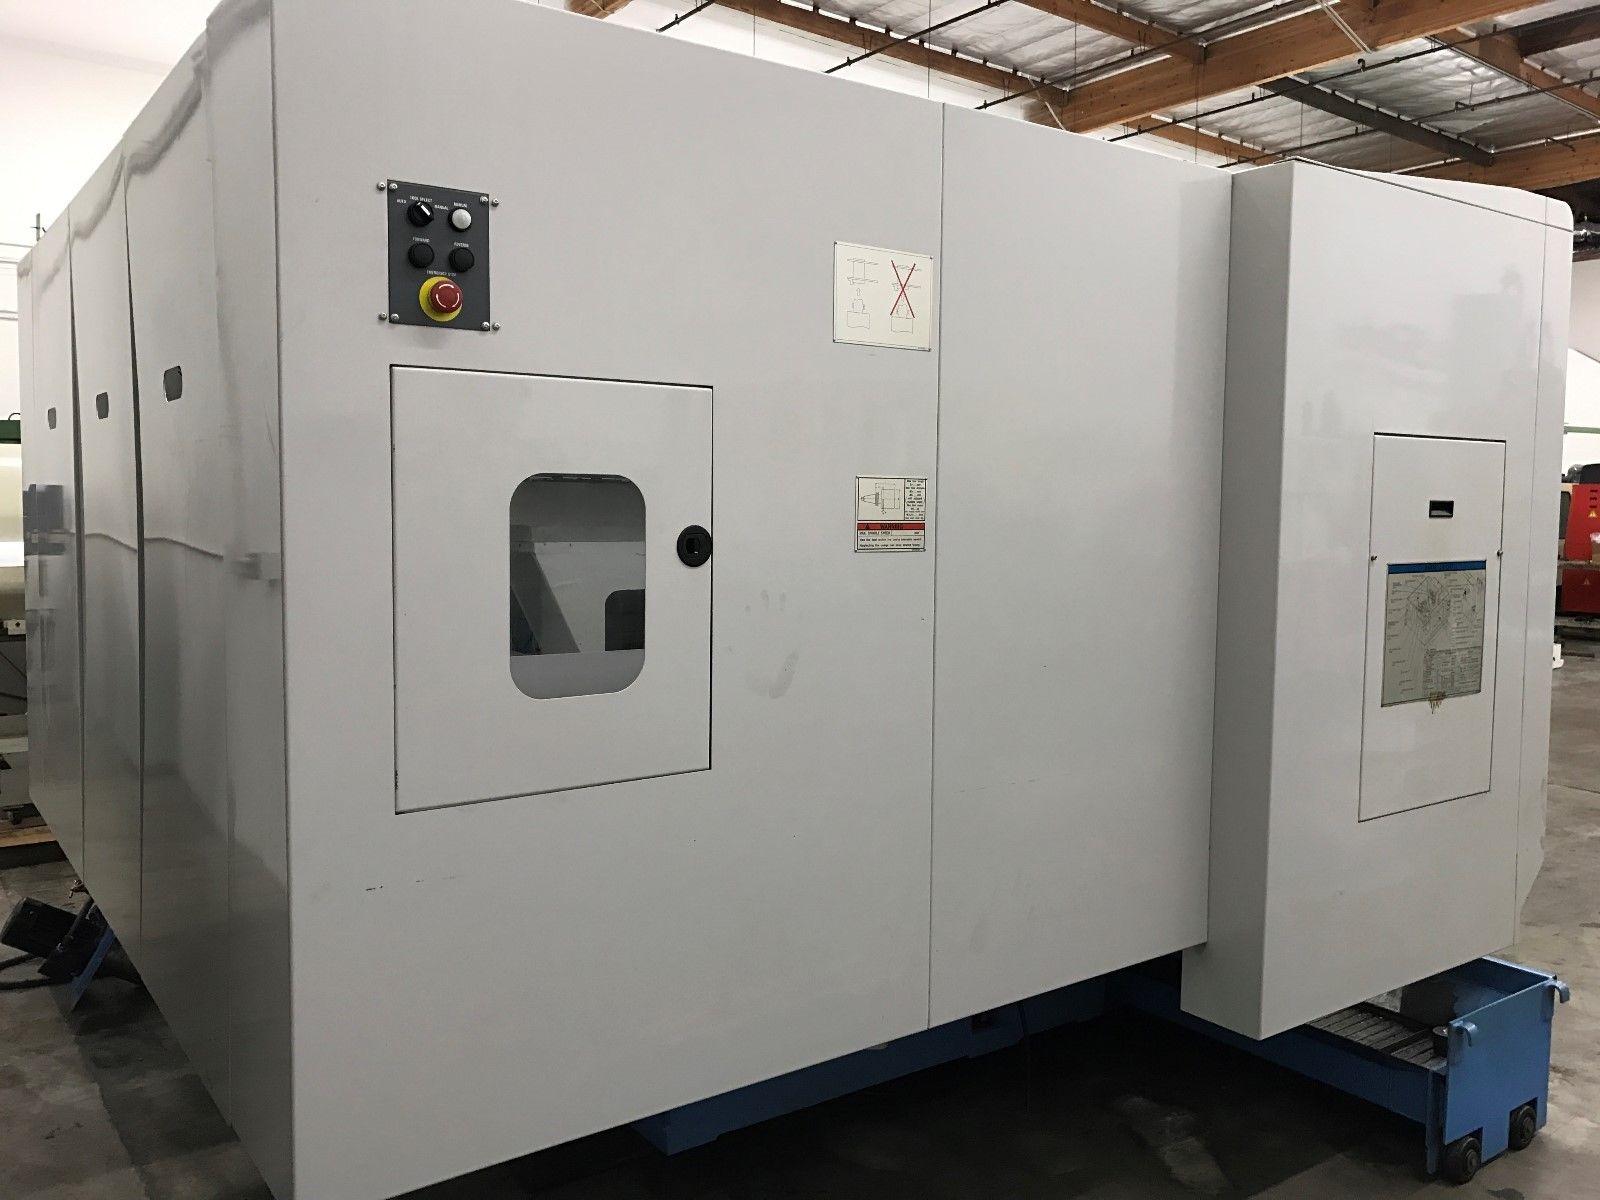 Mazak VTC 200B Vertical Machining Center - MachineStation